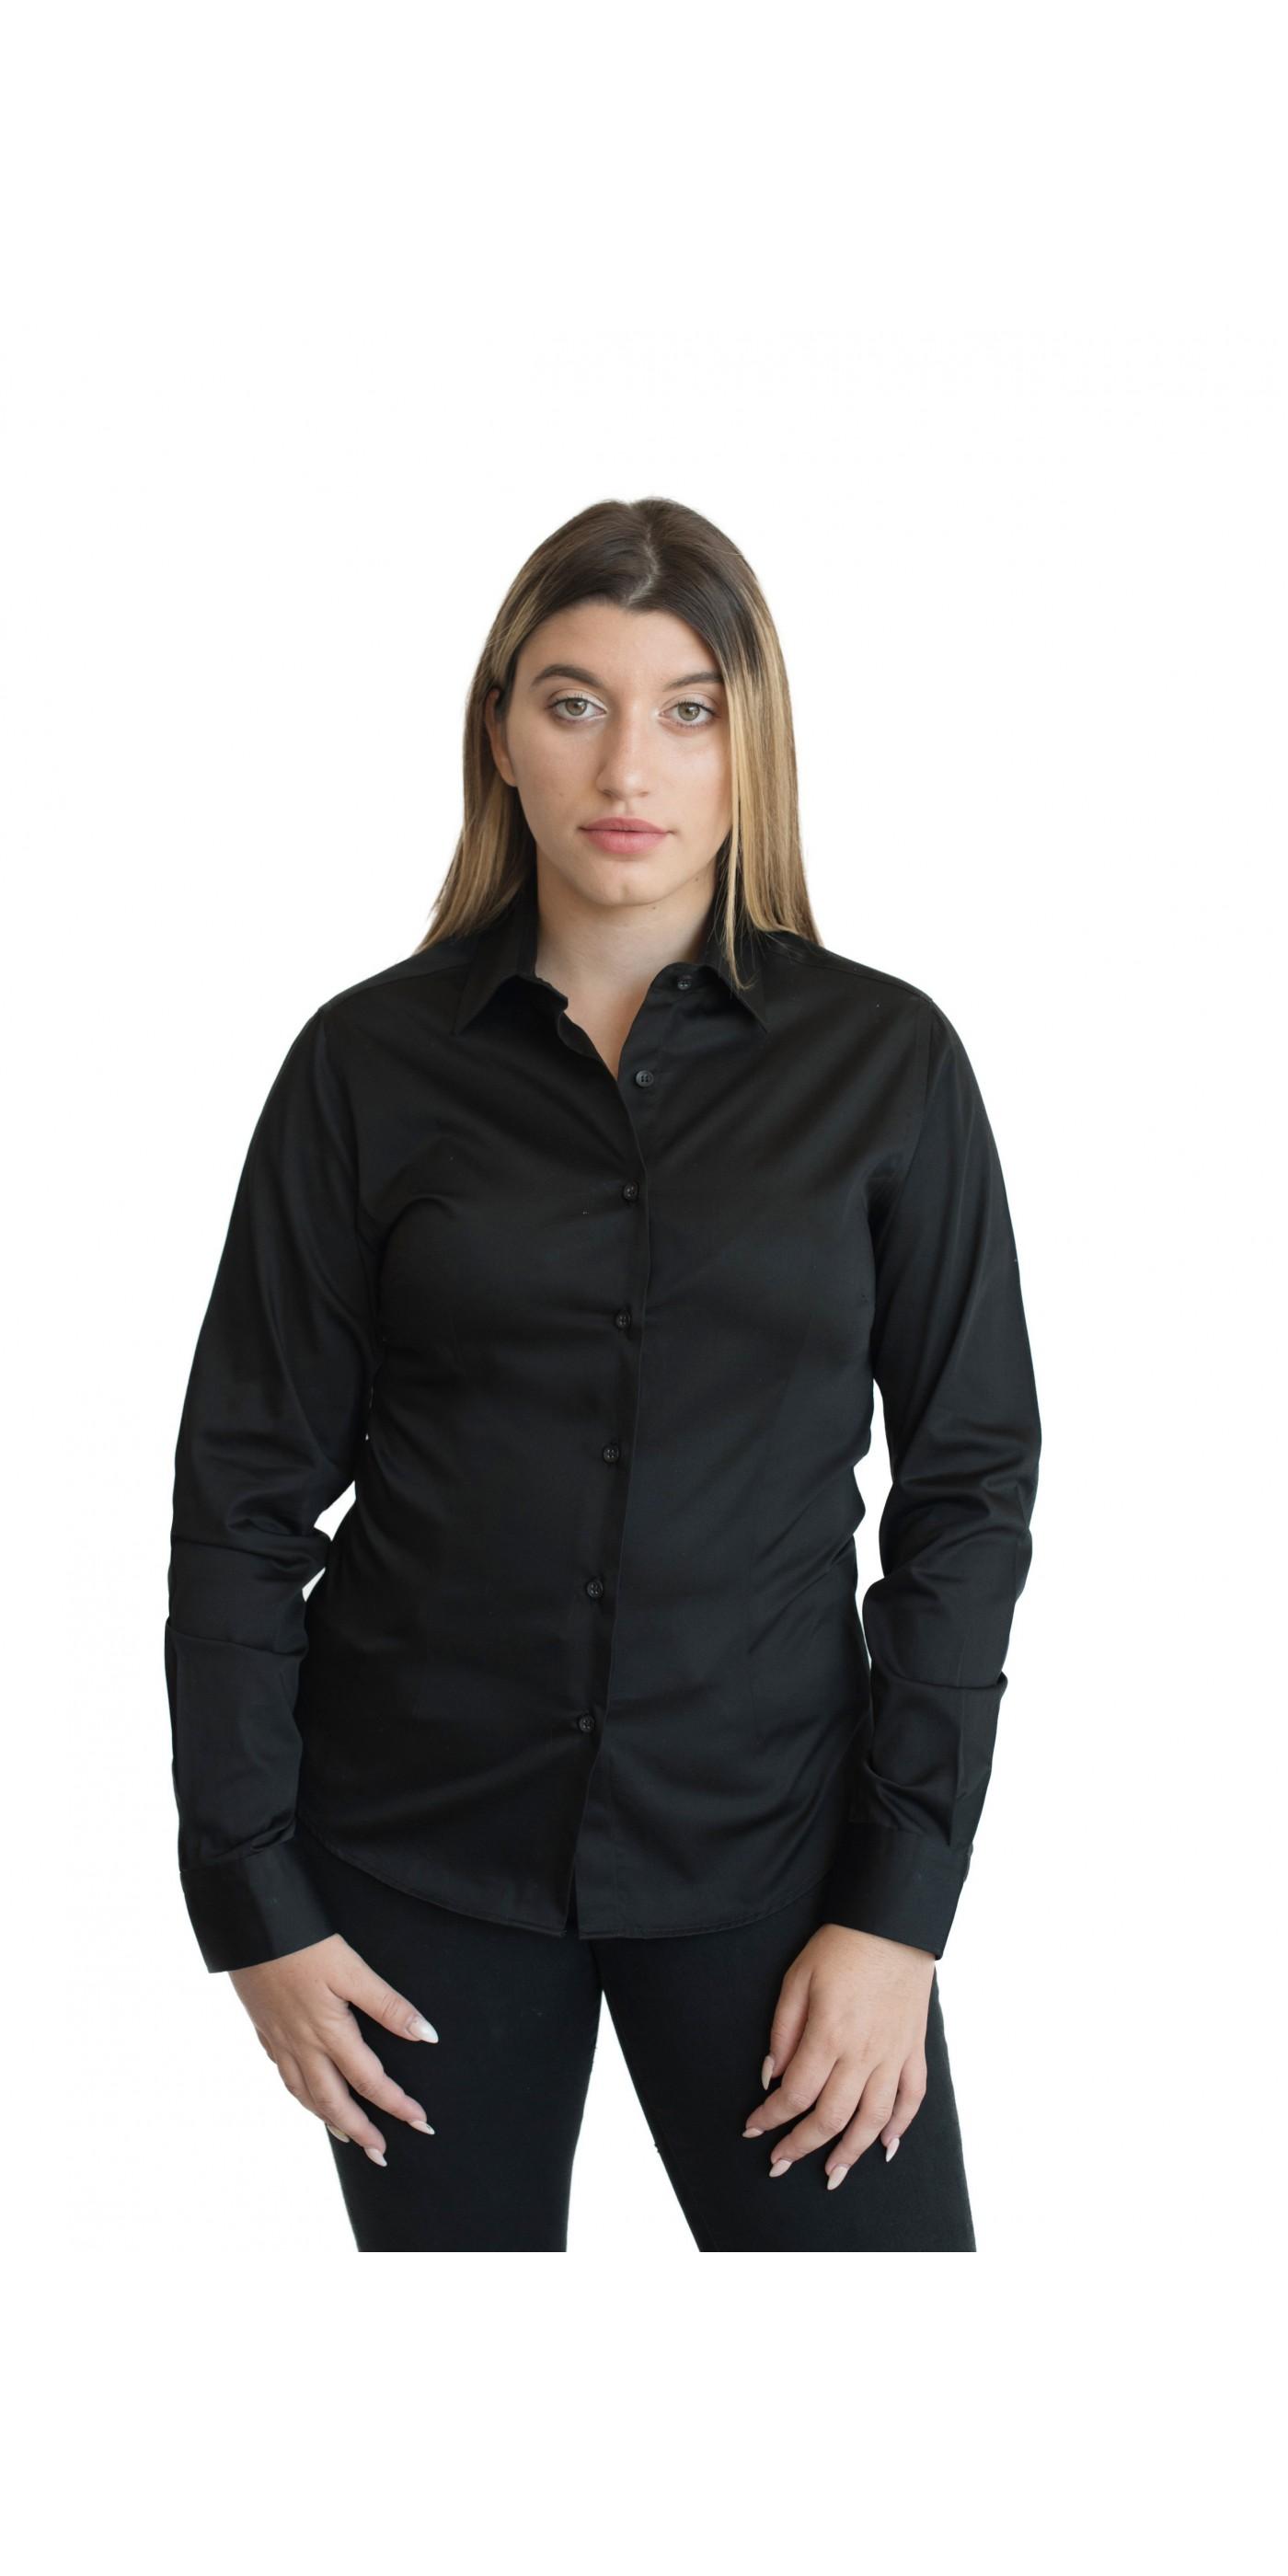 b7f3d98dcd01 Γυναικείο Πουκάμισο Μαύρο Πουκάμισο Total Black - ELENA. Loading zoom